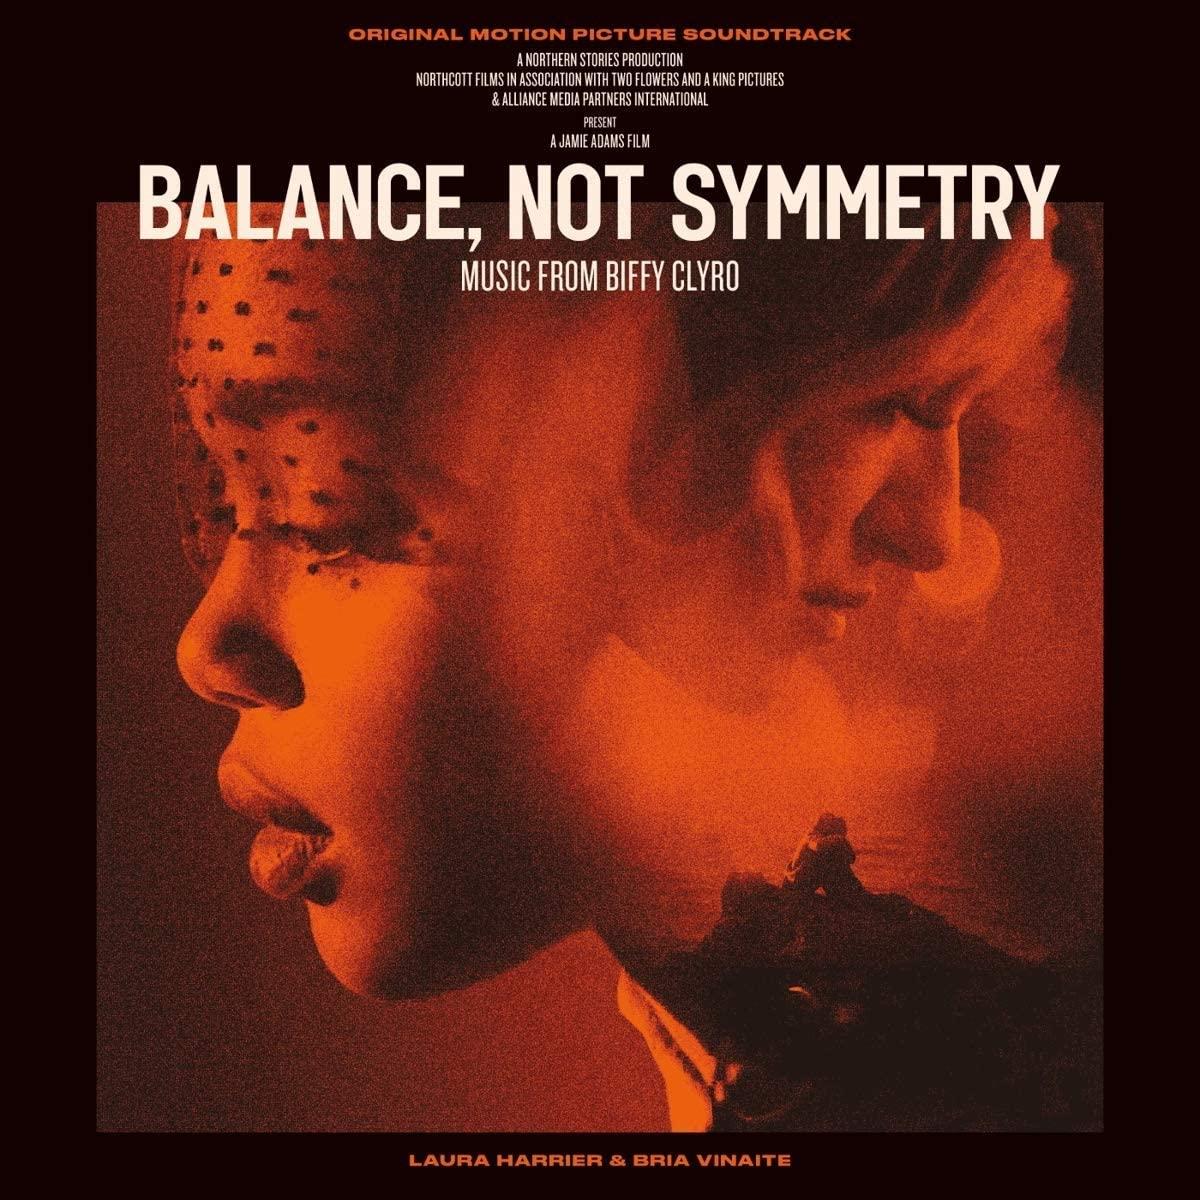 Biffy Clyro – Balance, Not Symmetry OST